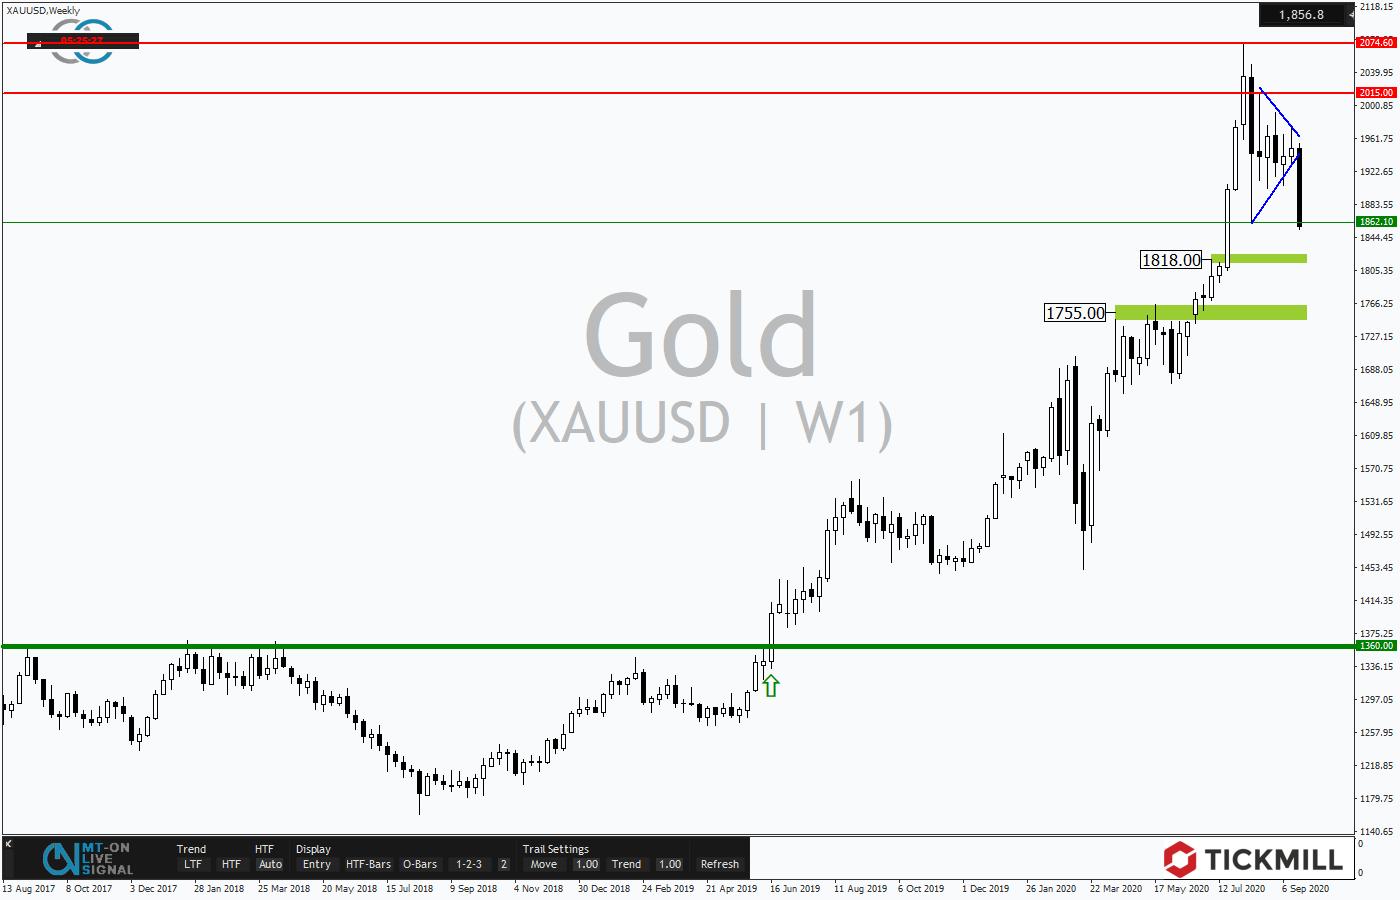 Tickmill-Analyse: Gold im Wochenchart